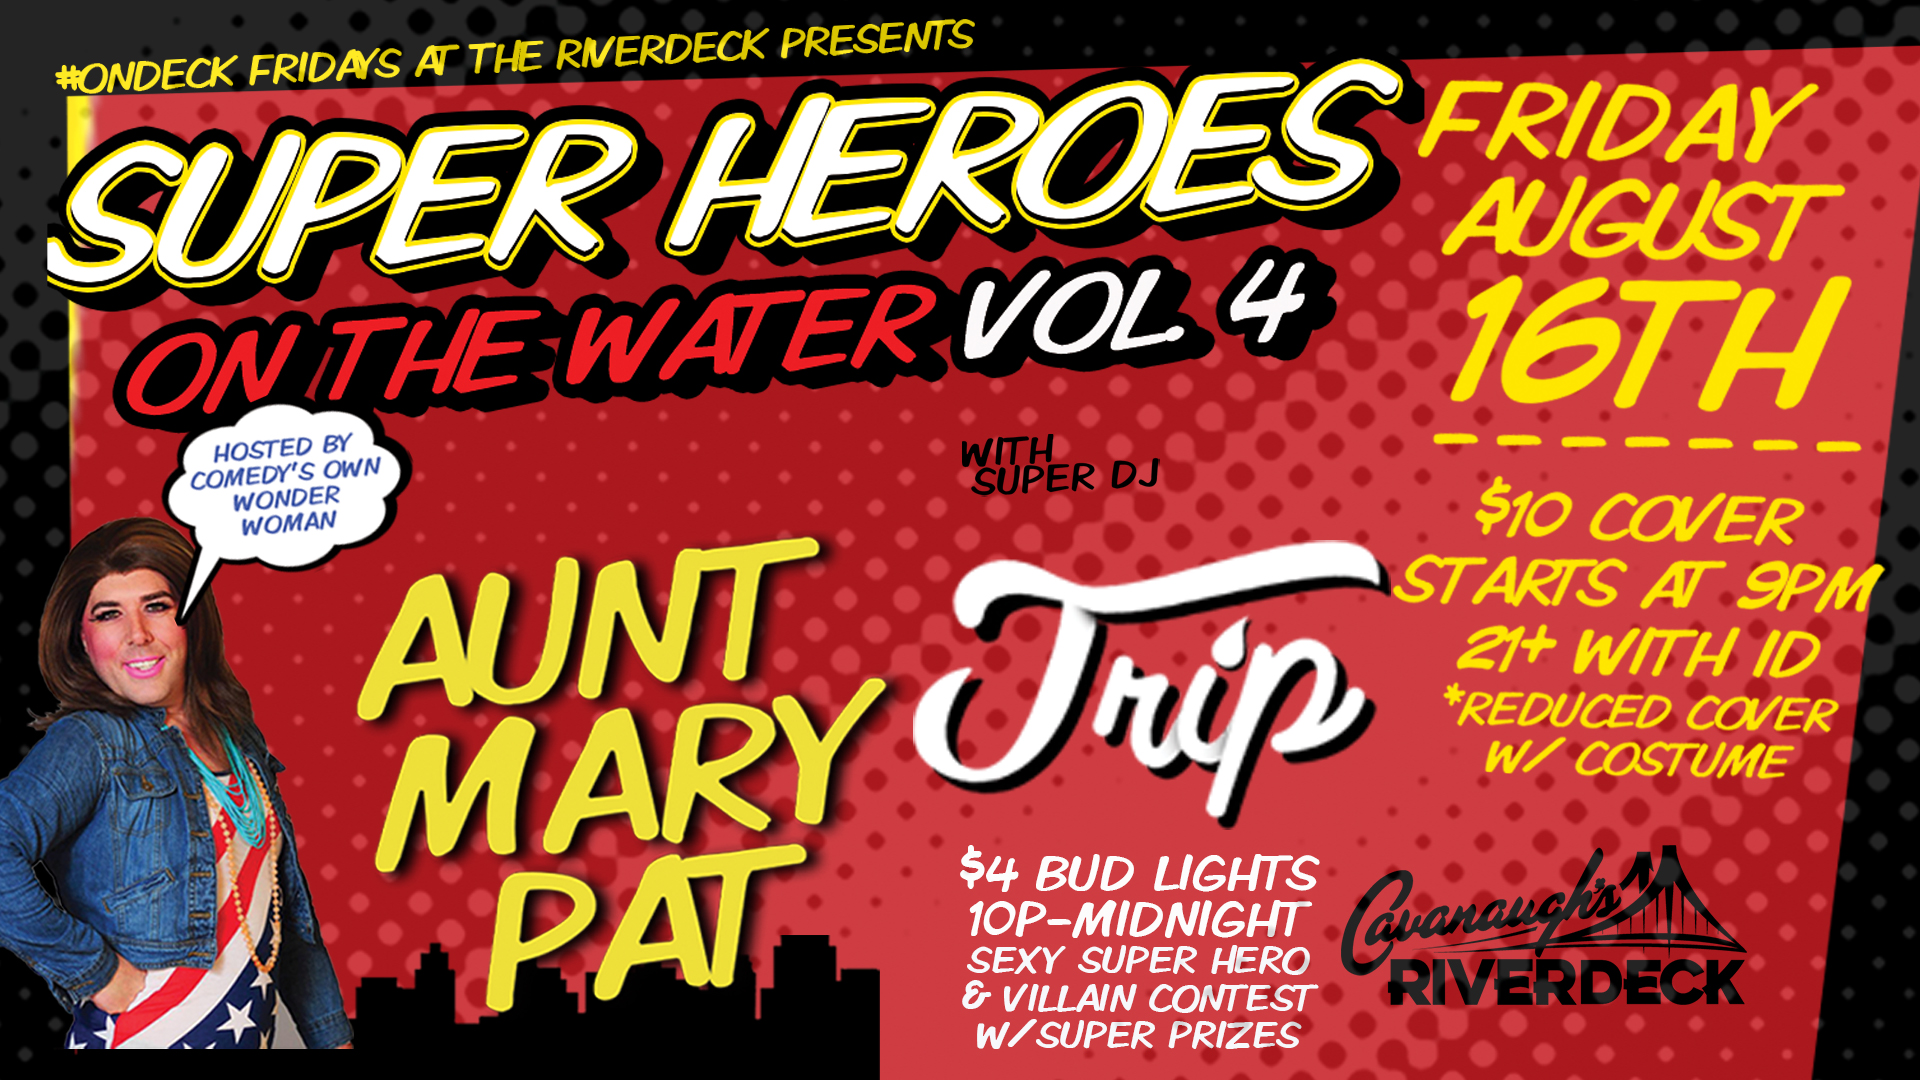 Superheroes_Event Cover.jpg